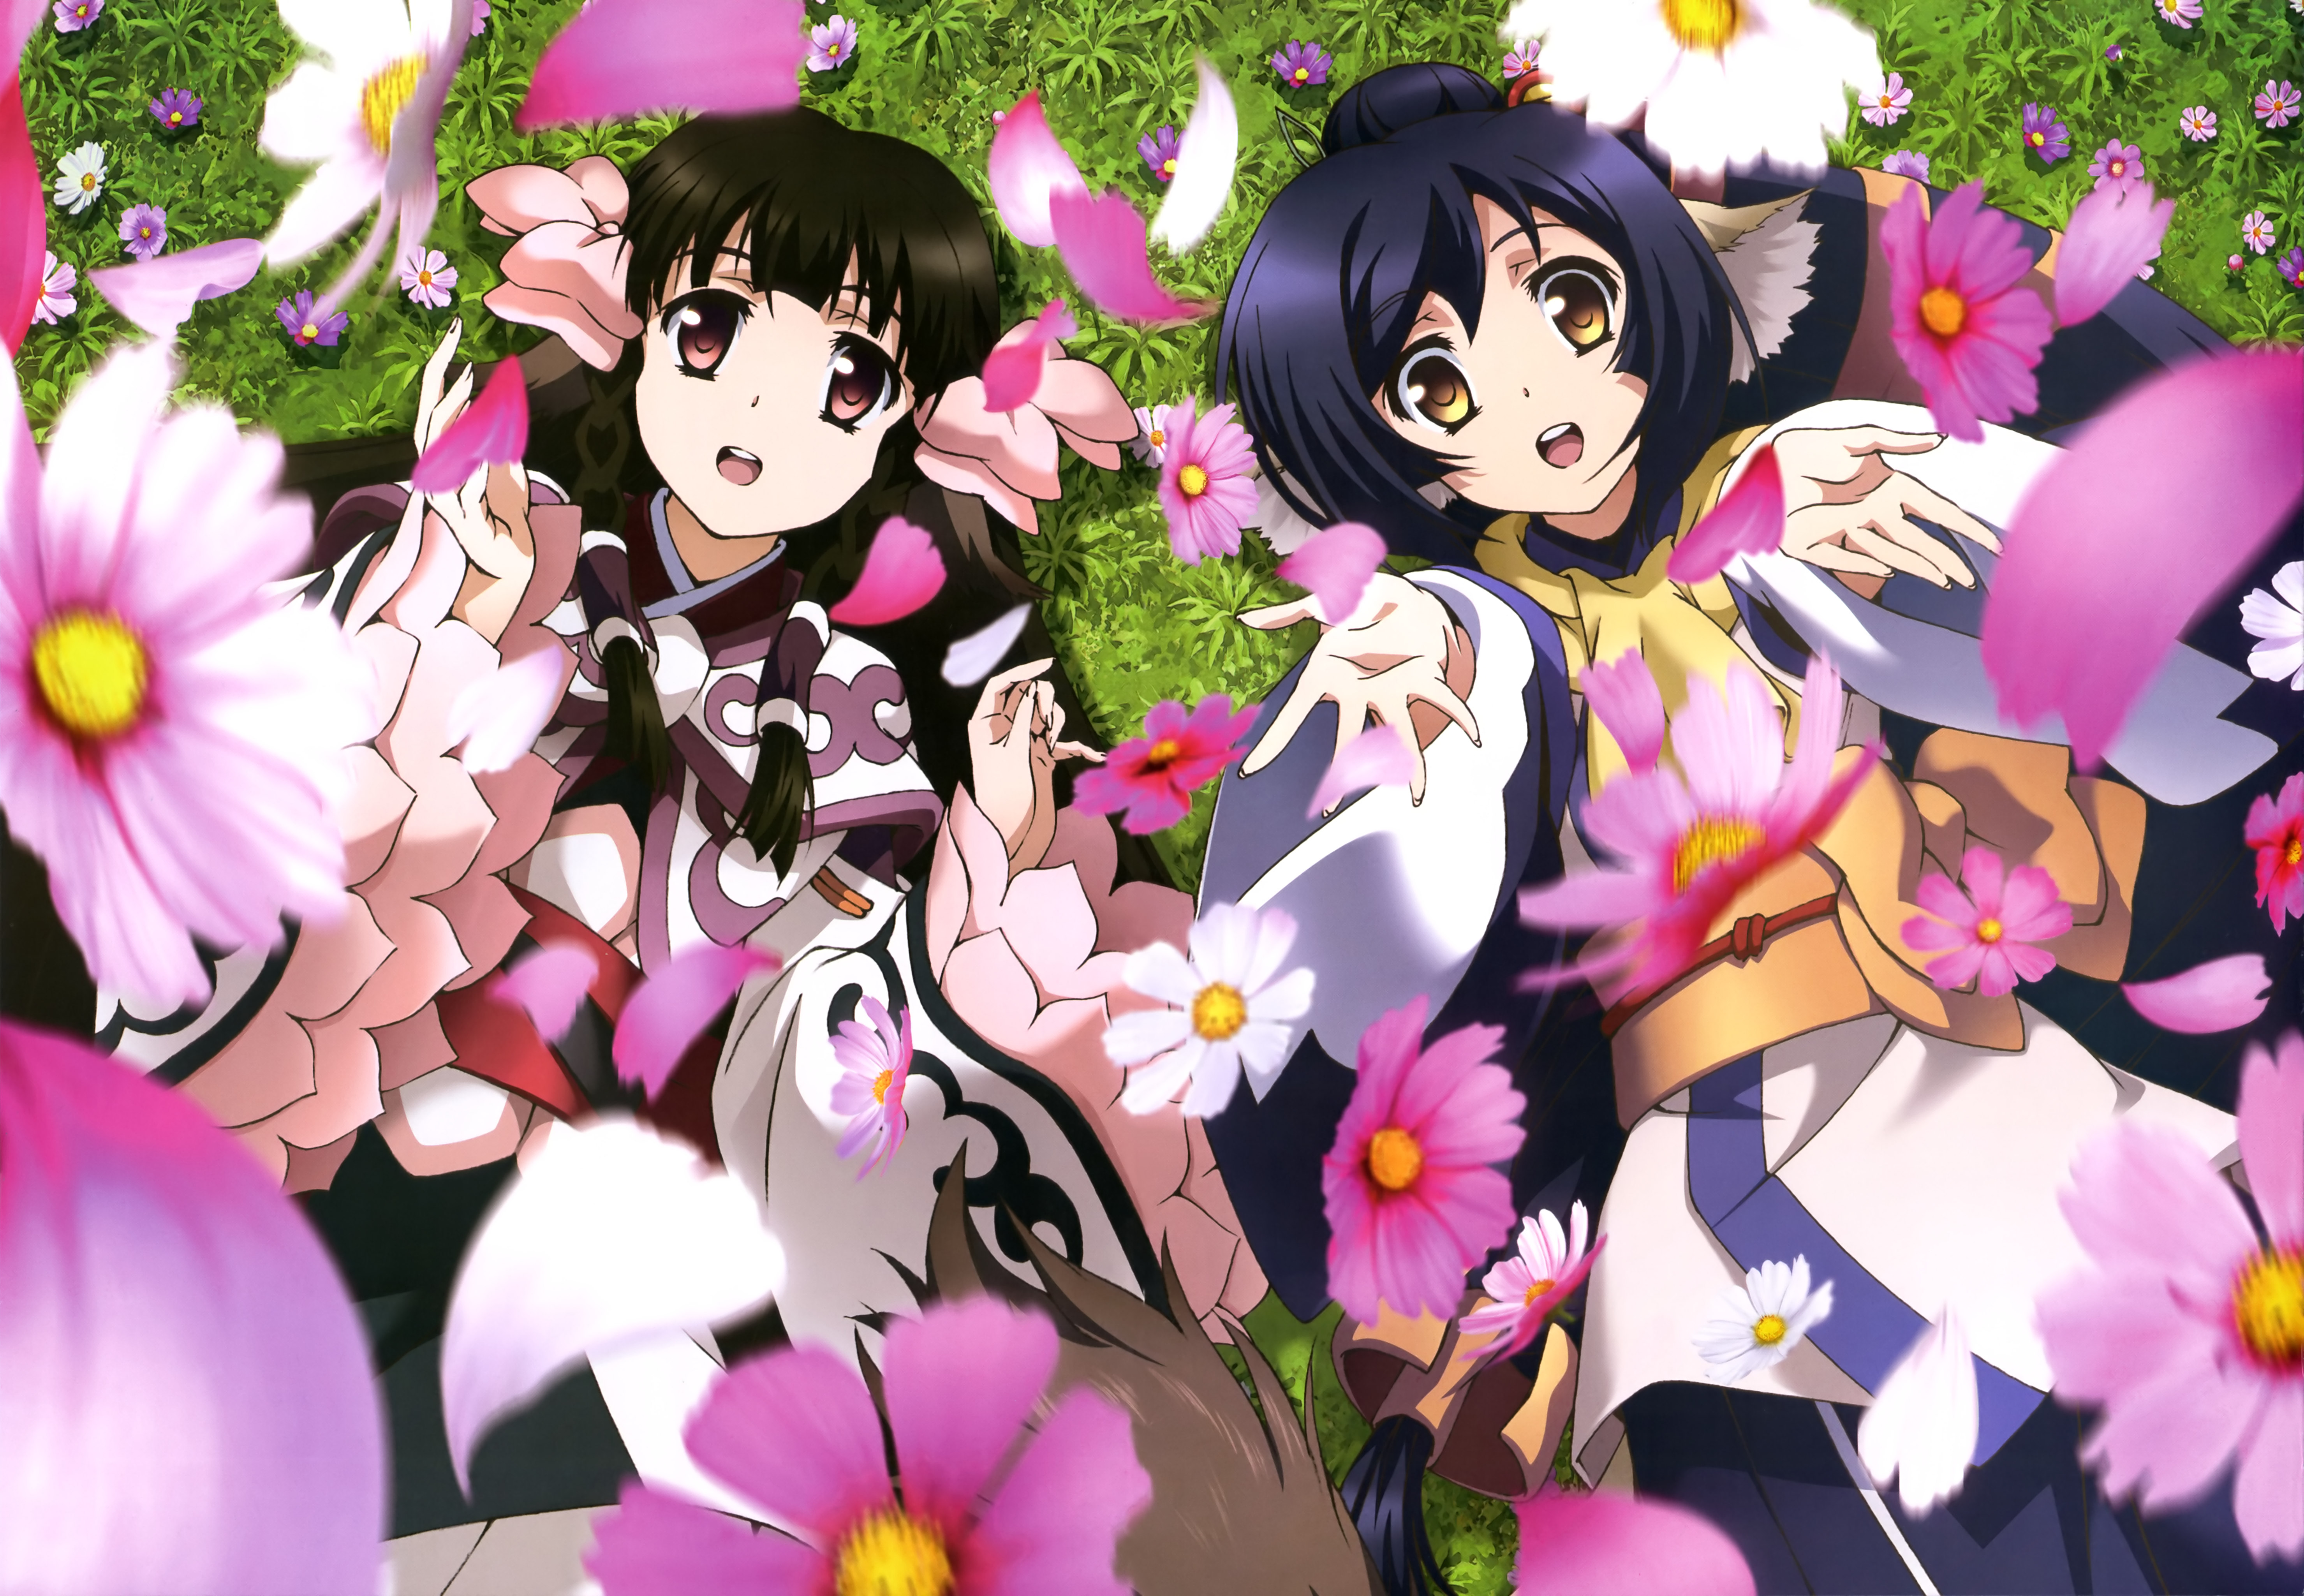 NyanType Magazine November 2015 anime posters utawarerumono itsuwari no kamen